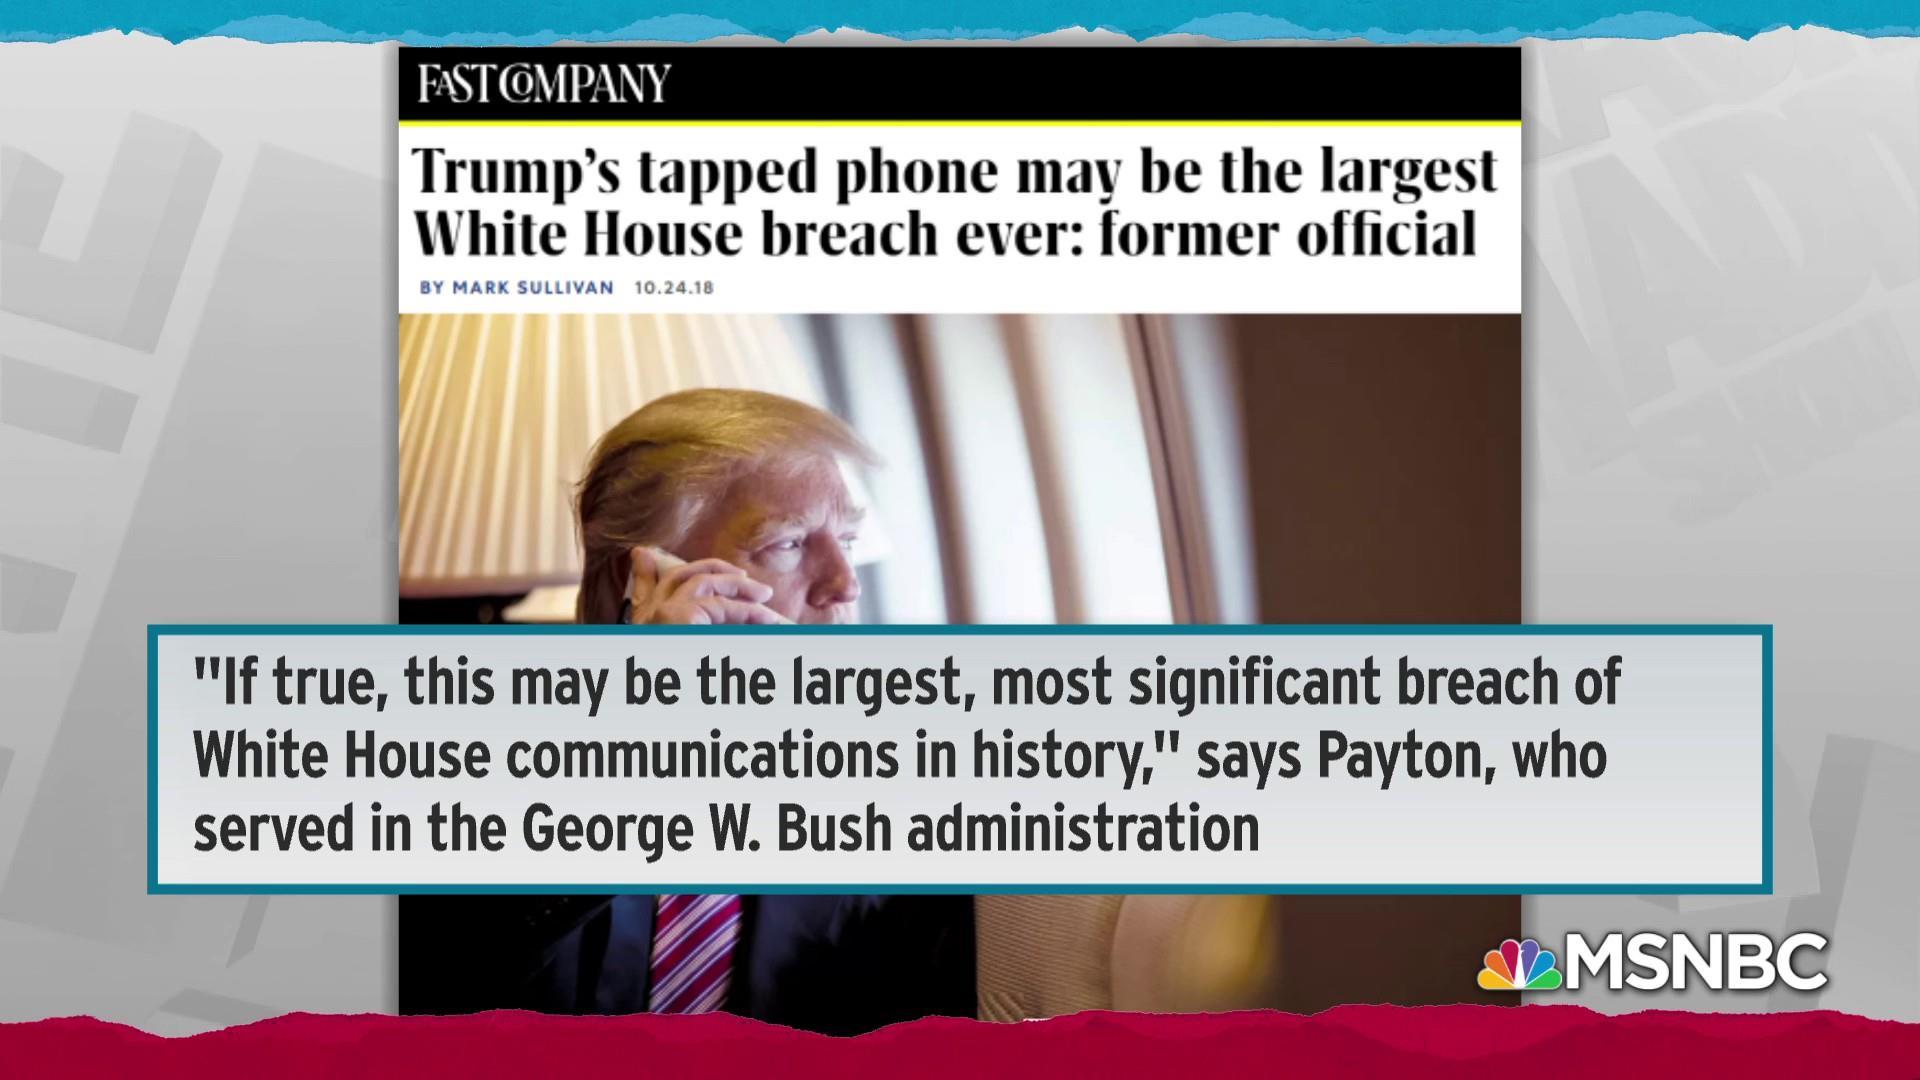 Trump sharing sensitive info on insecure phone worries U.S. intel